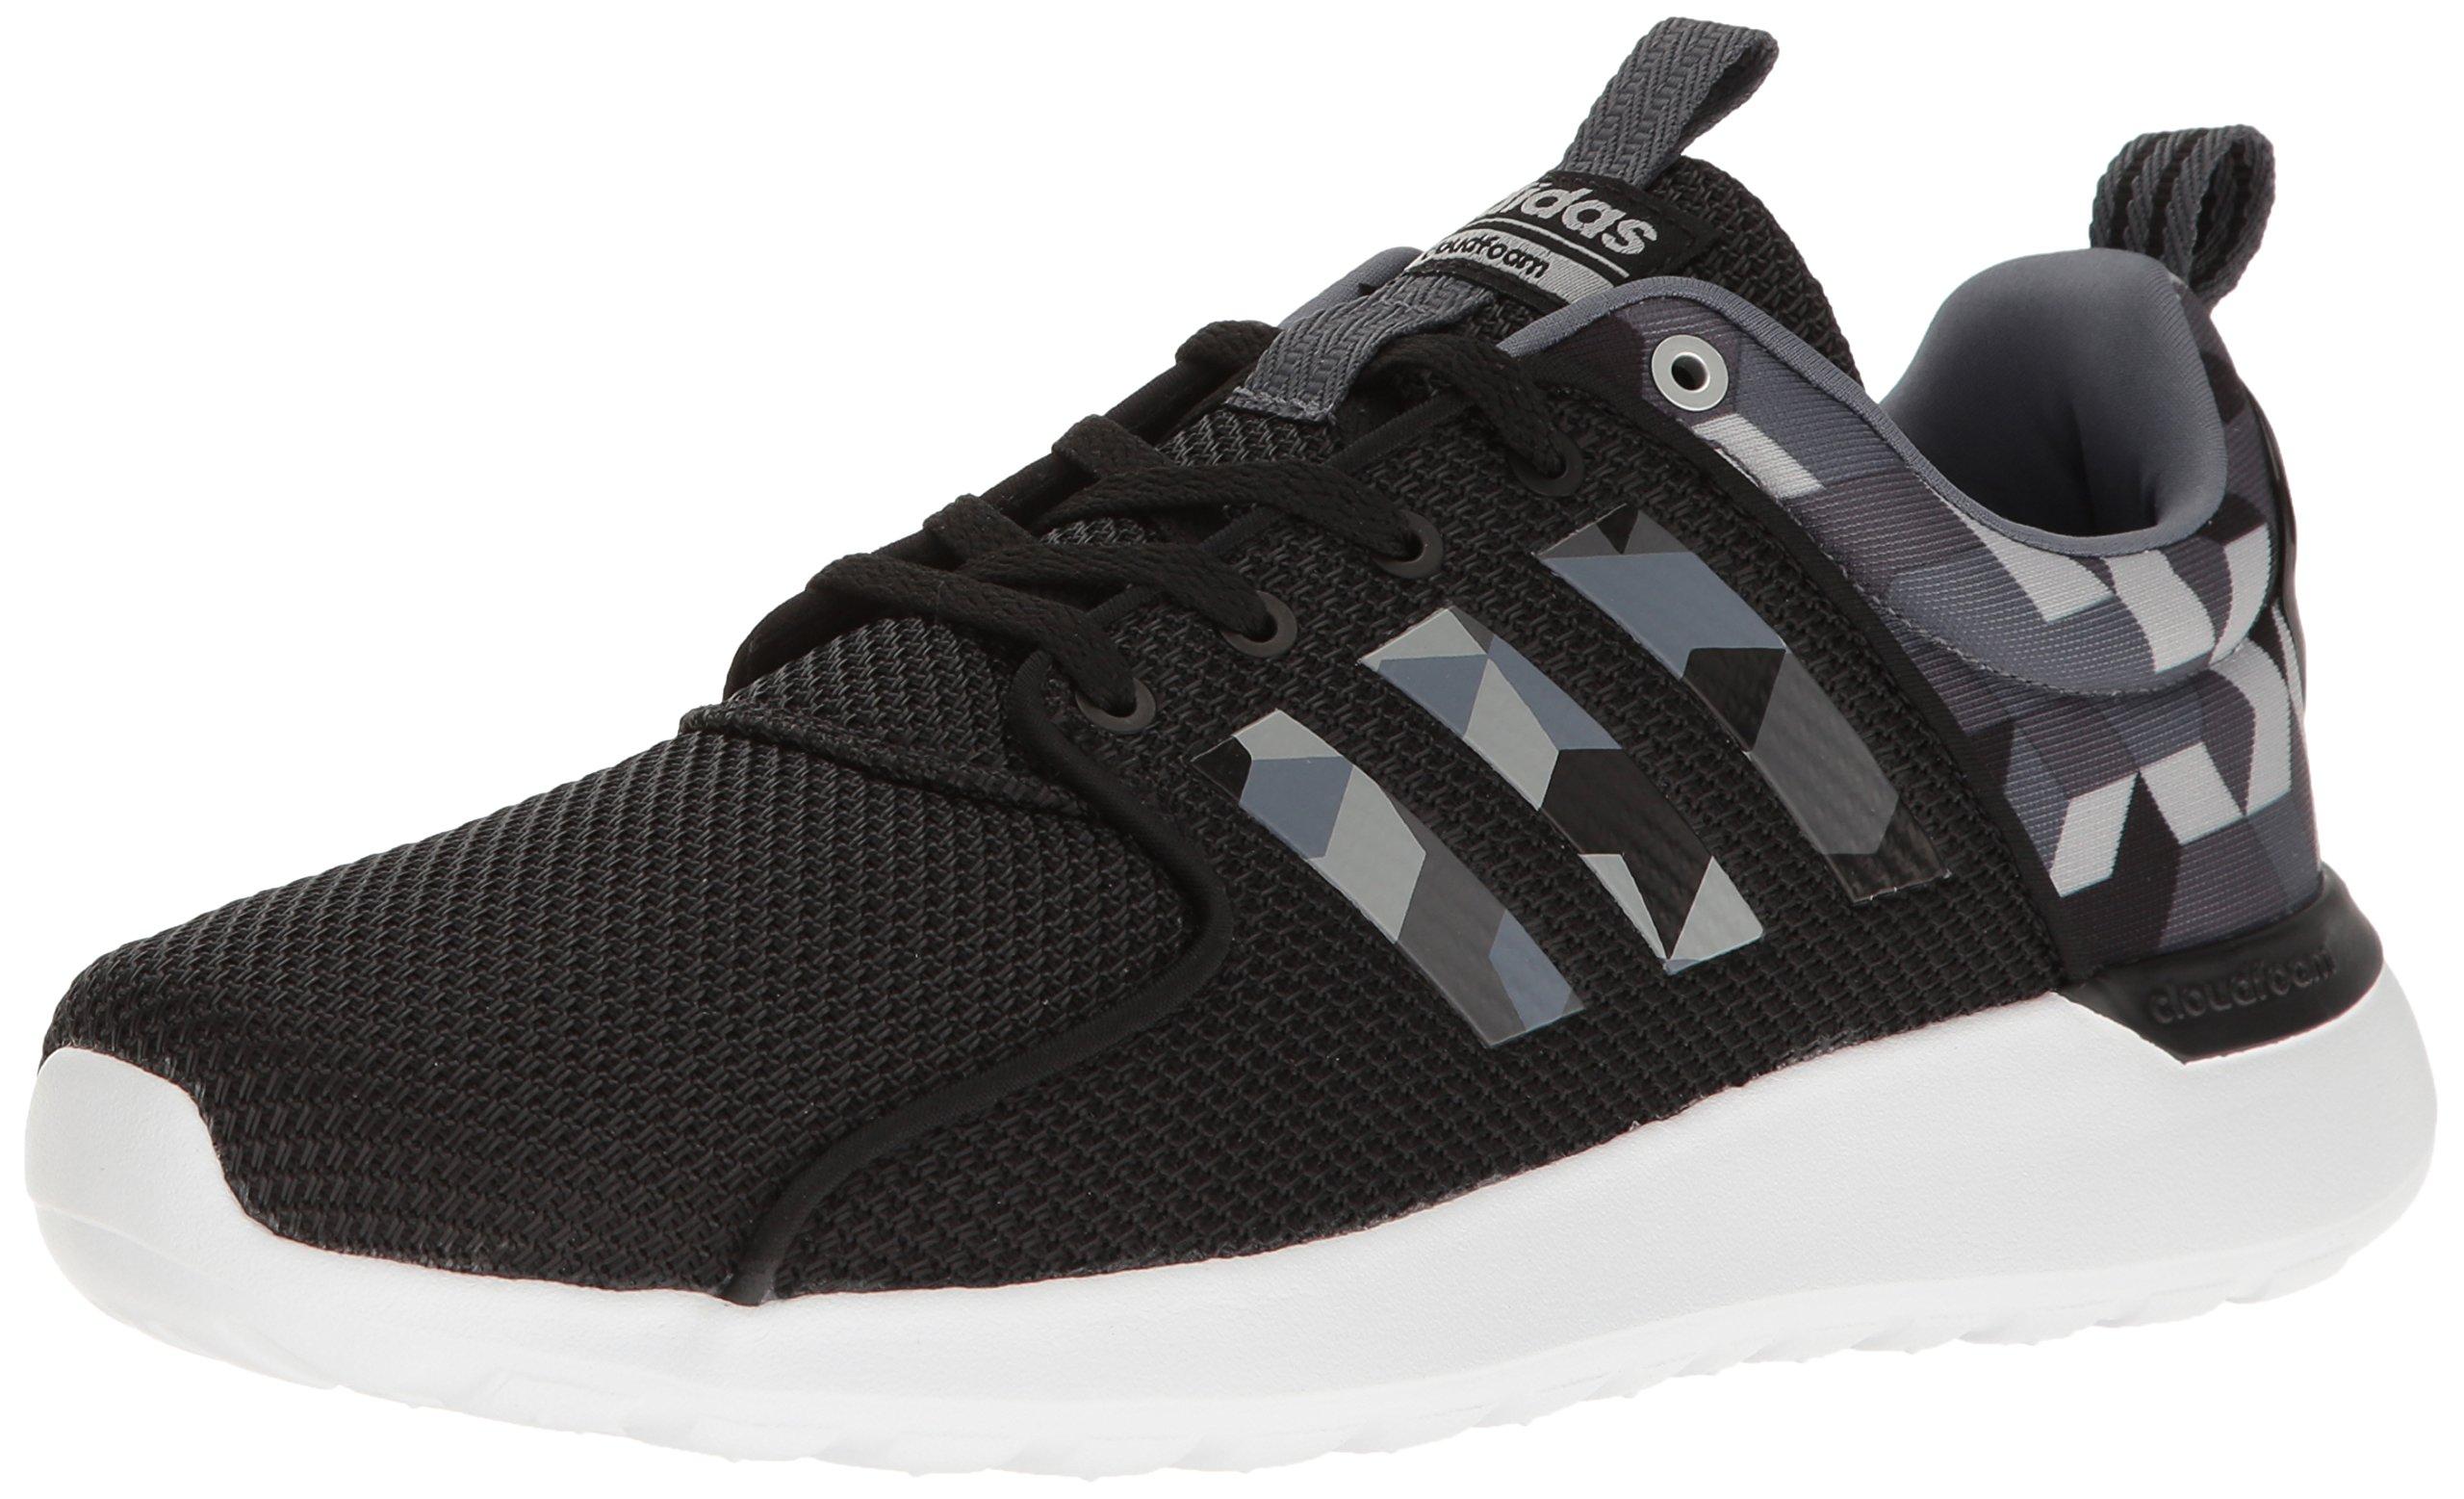 size 40 e9127 5d245 Galleon - Adidas Men s Cloudfoam Lite Racer Running Shoe, Black Onix Solid  Grey, 9.5 D-Medium